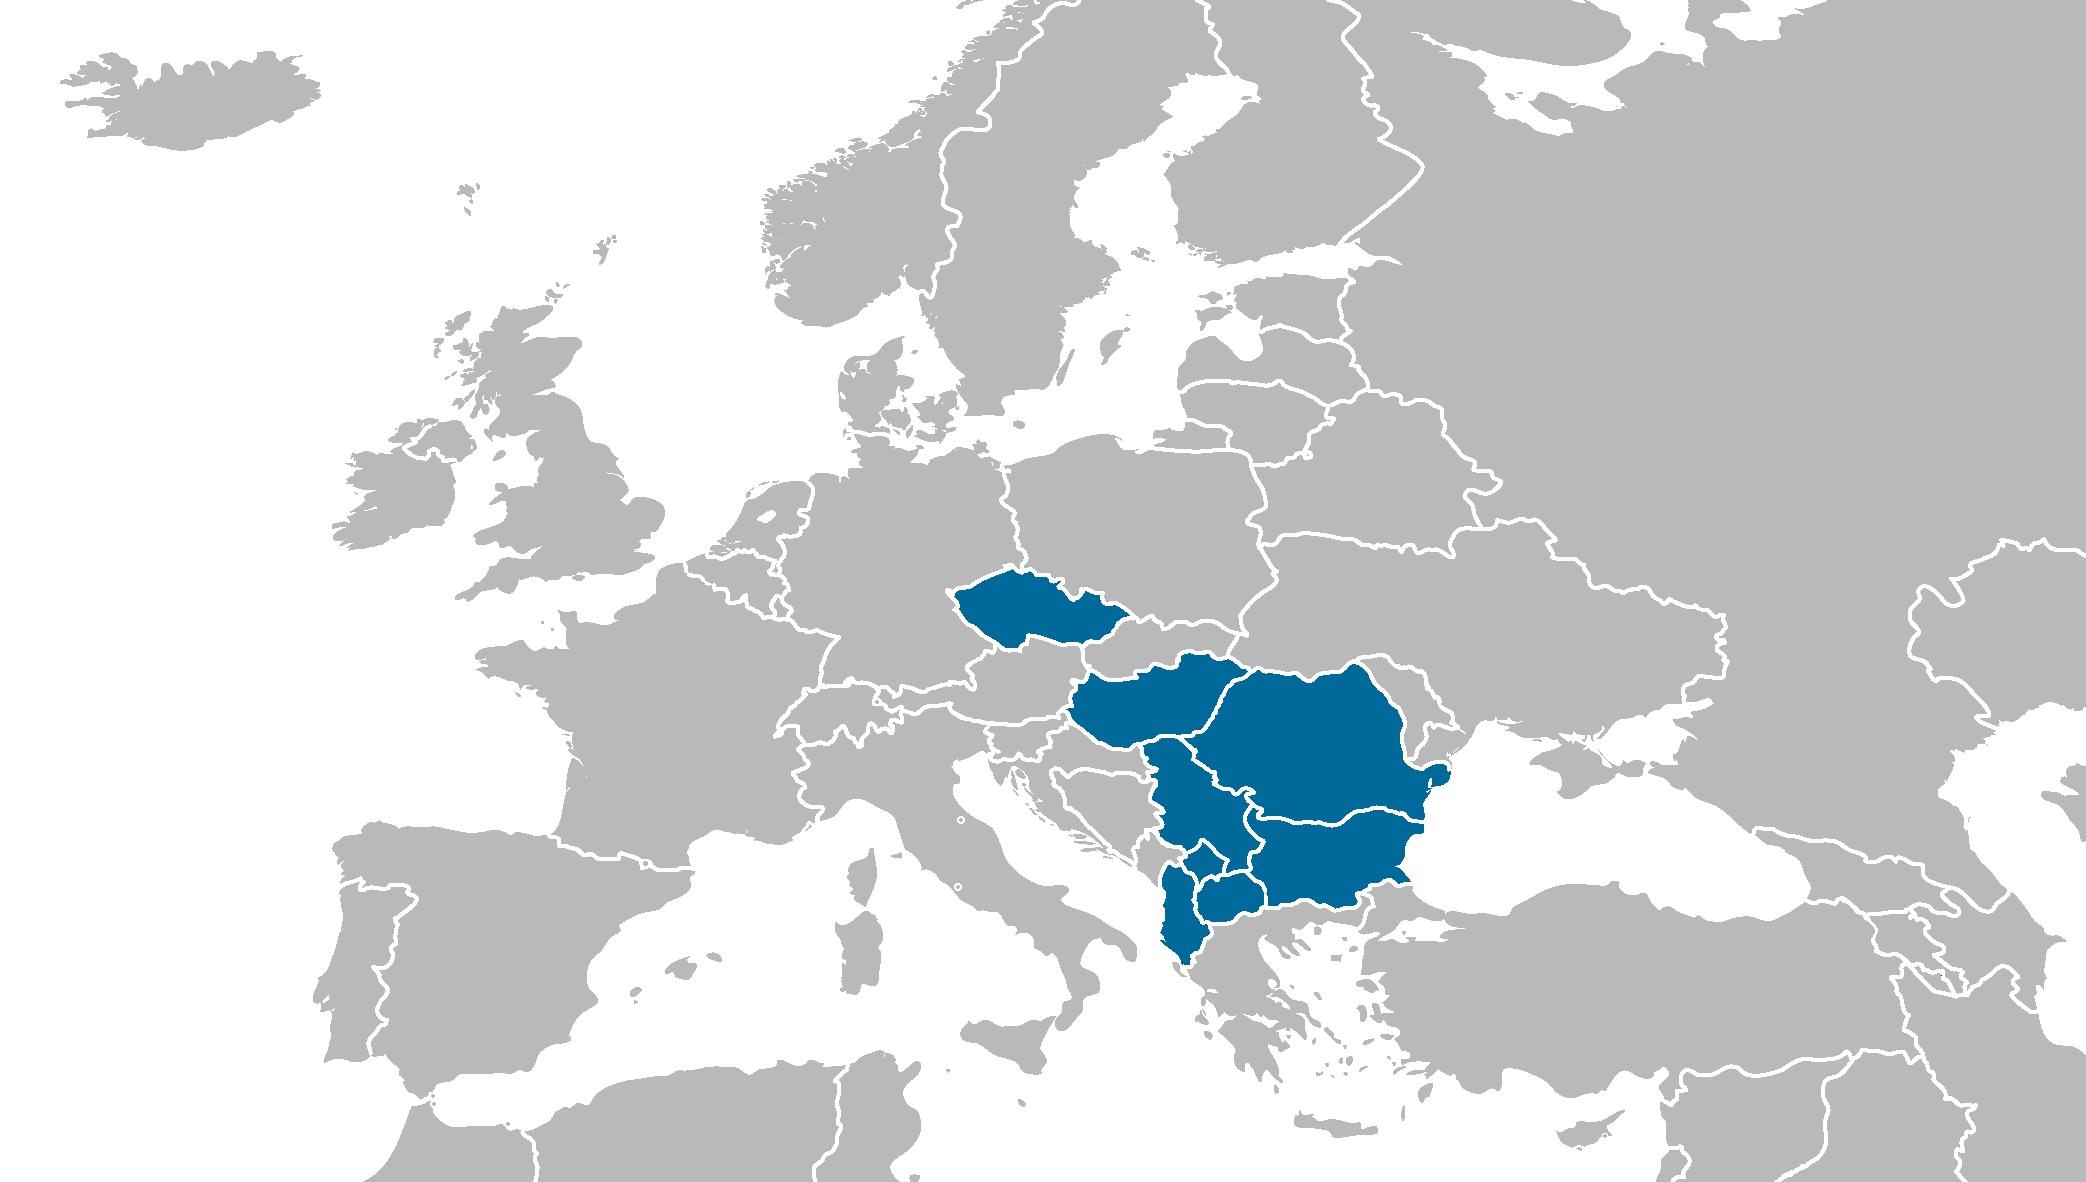 COMPUTER 2000 Bulgaria - Regional Distributor of Cybersecurity Solutions